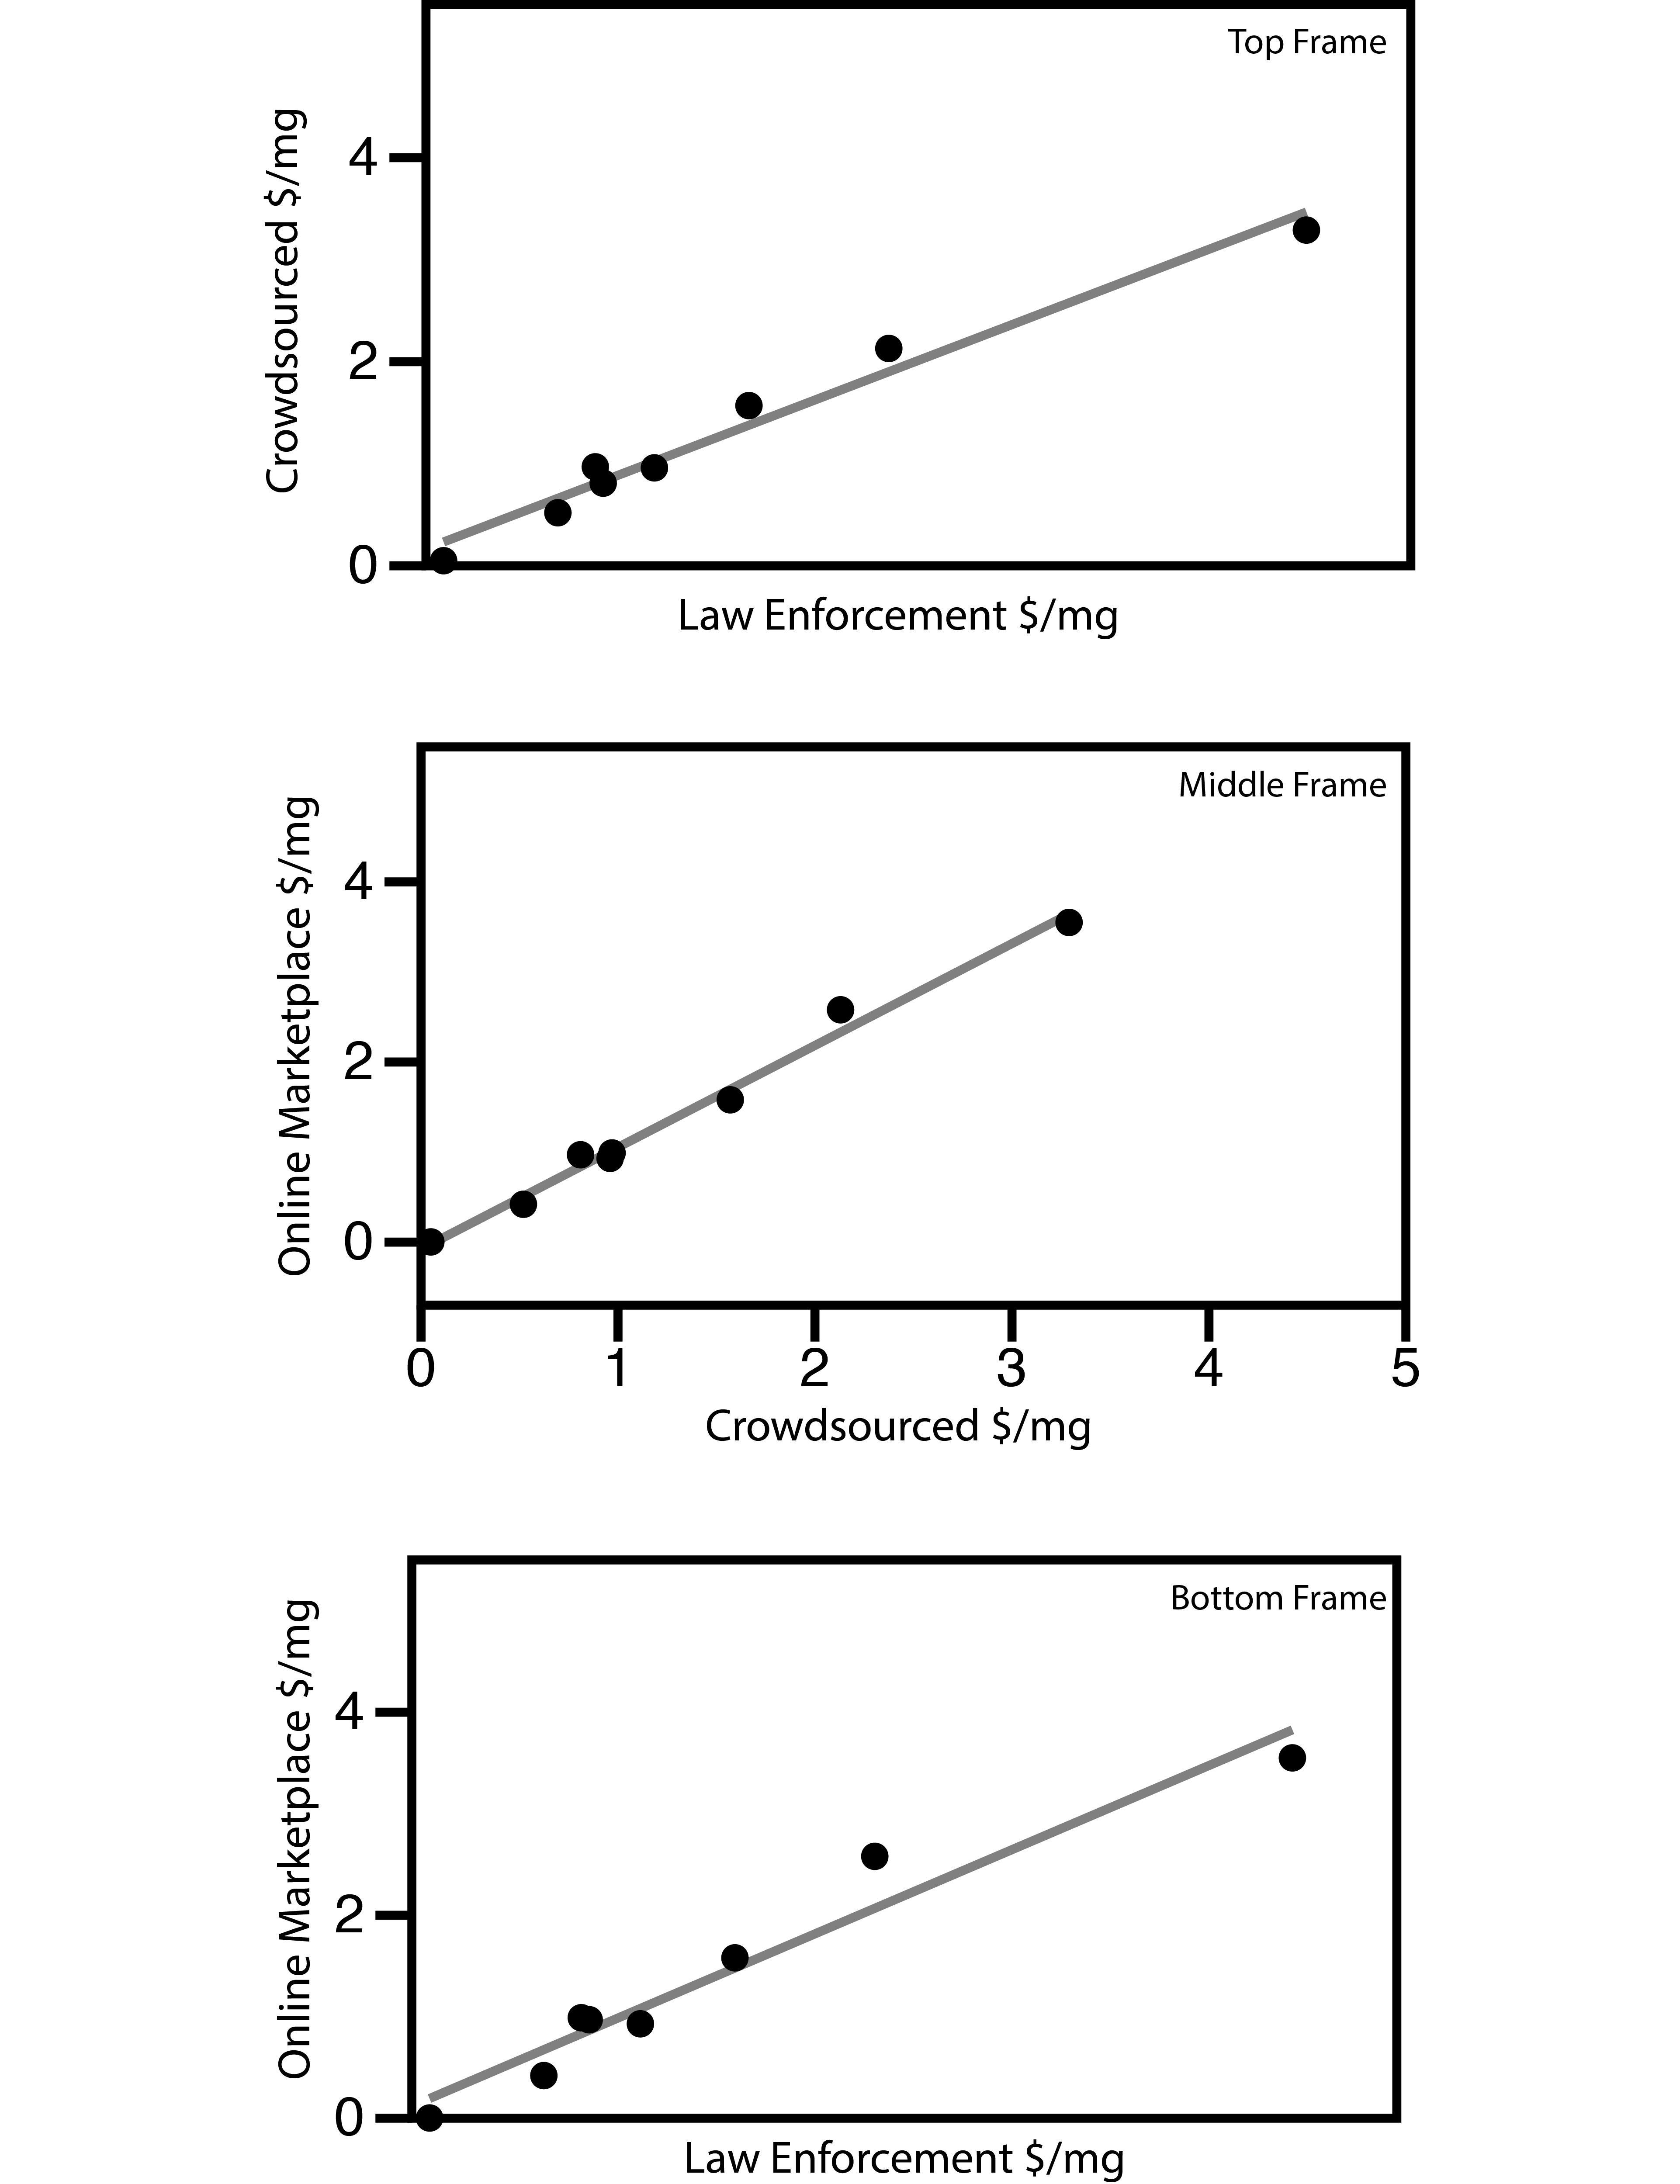 JMIR-Crowdsourcing Black Market Prices For Prescription Opioids ...